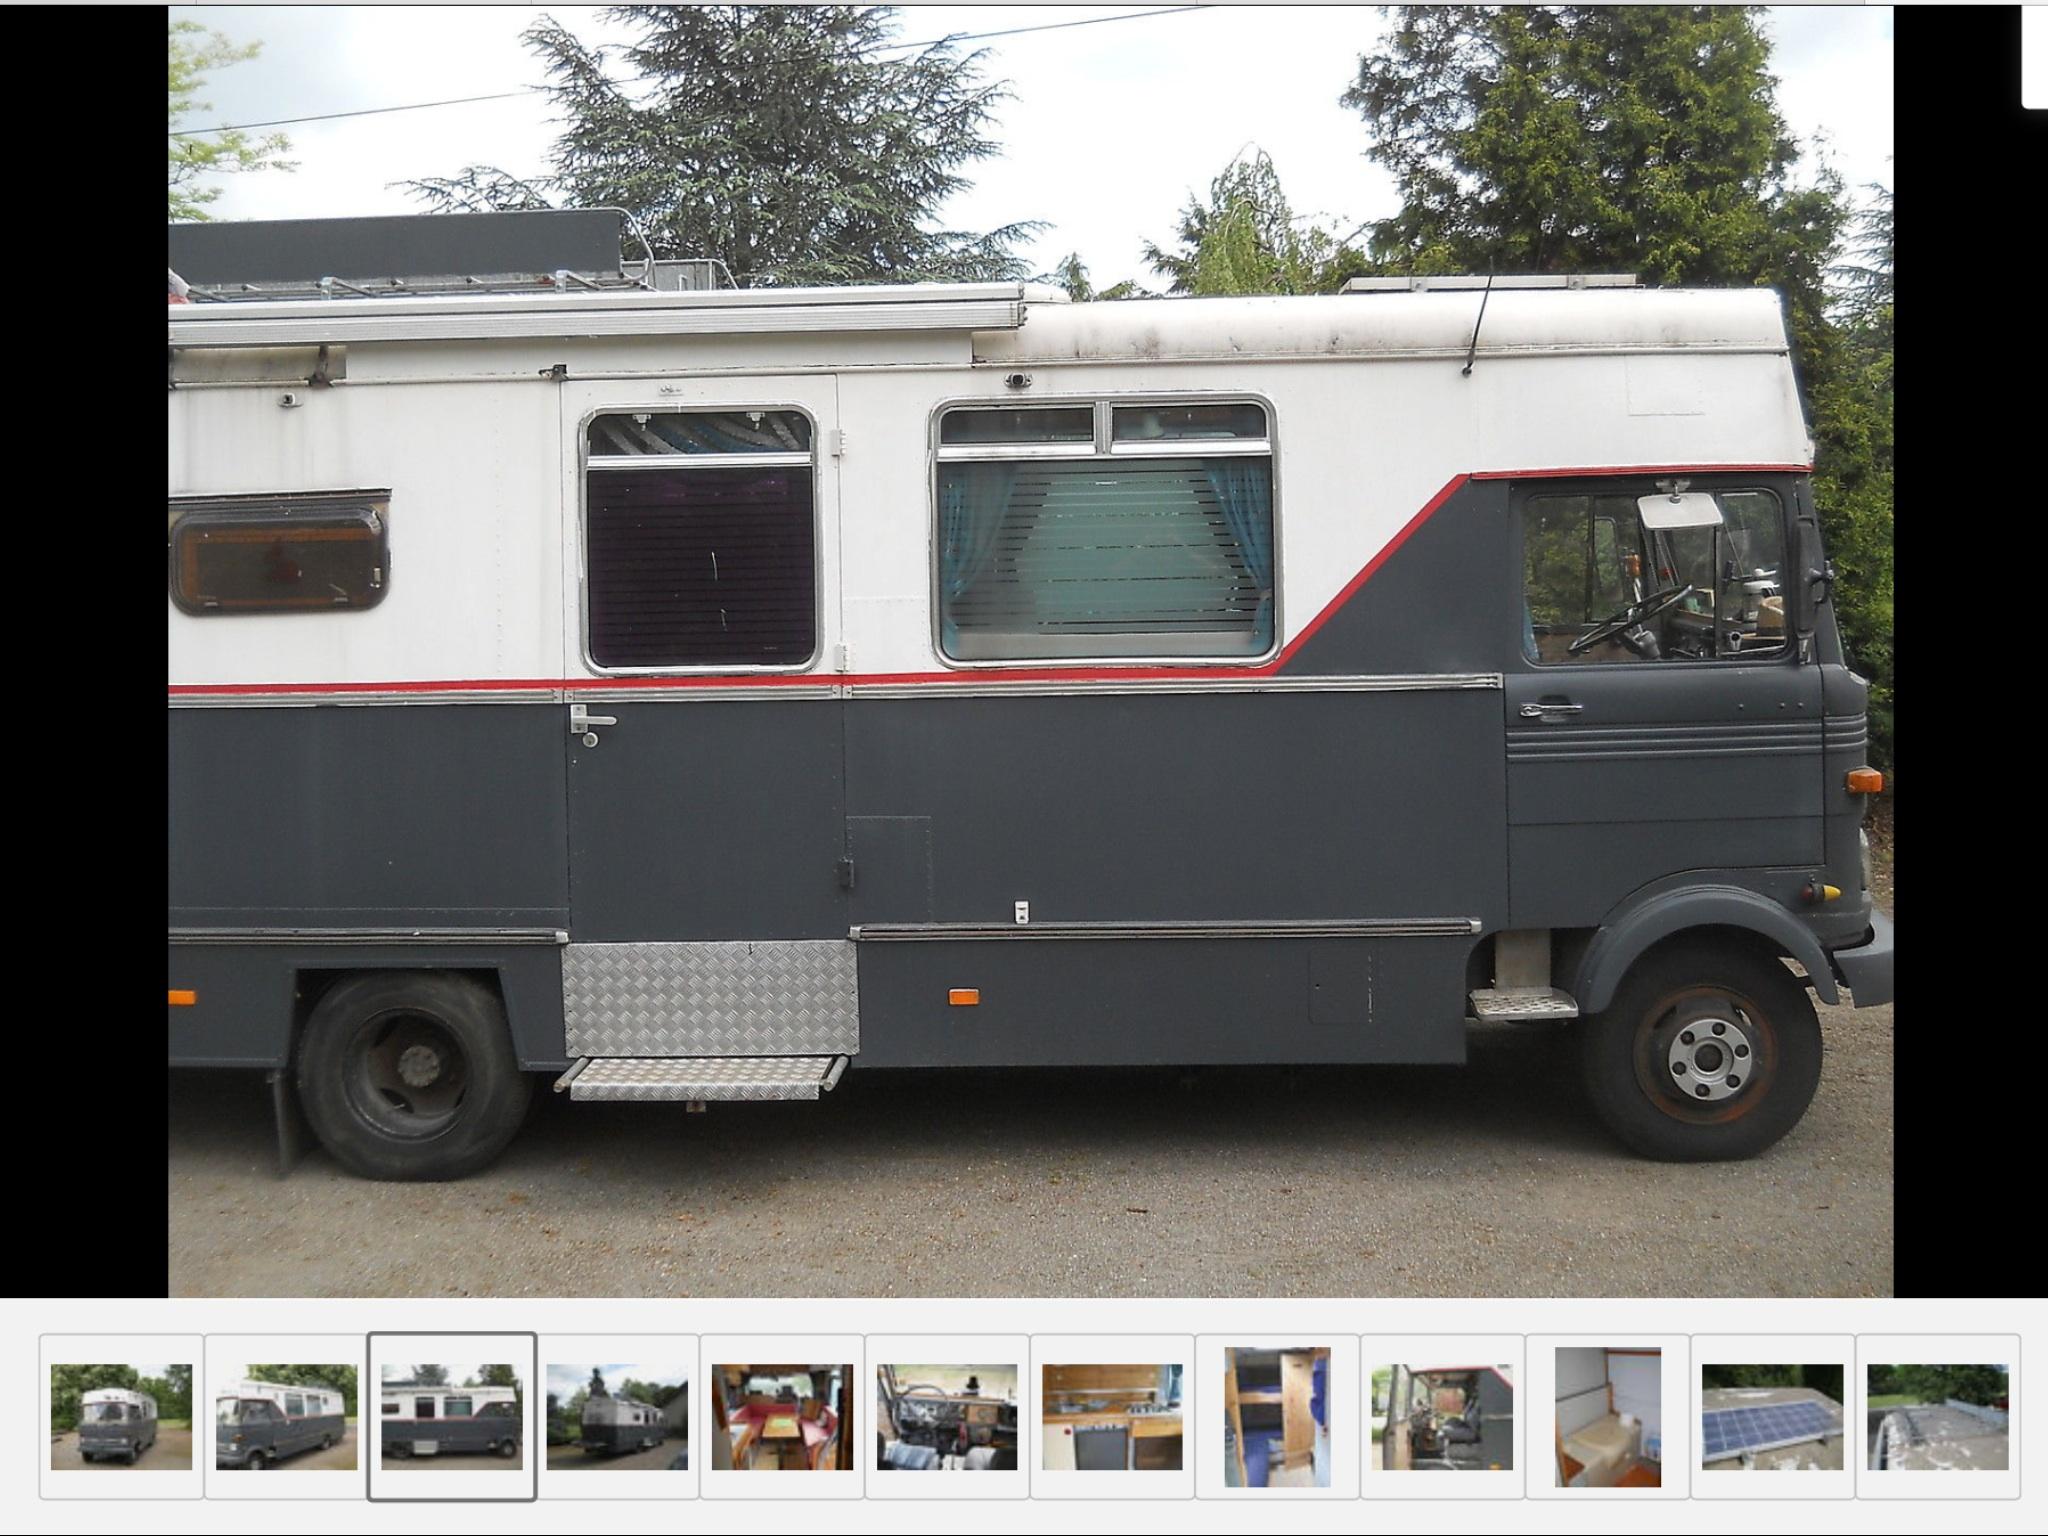 mercedes nutzfahrzeuge lp 608 810531. Black Bedroom Furniture Sets. Home Design Ideas